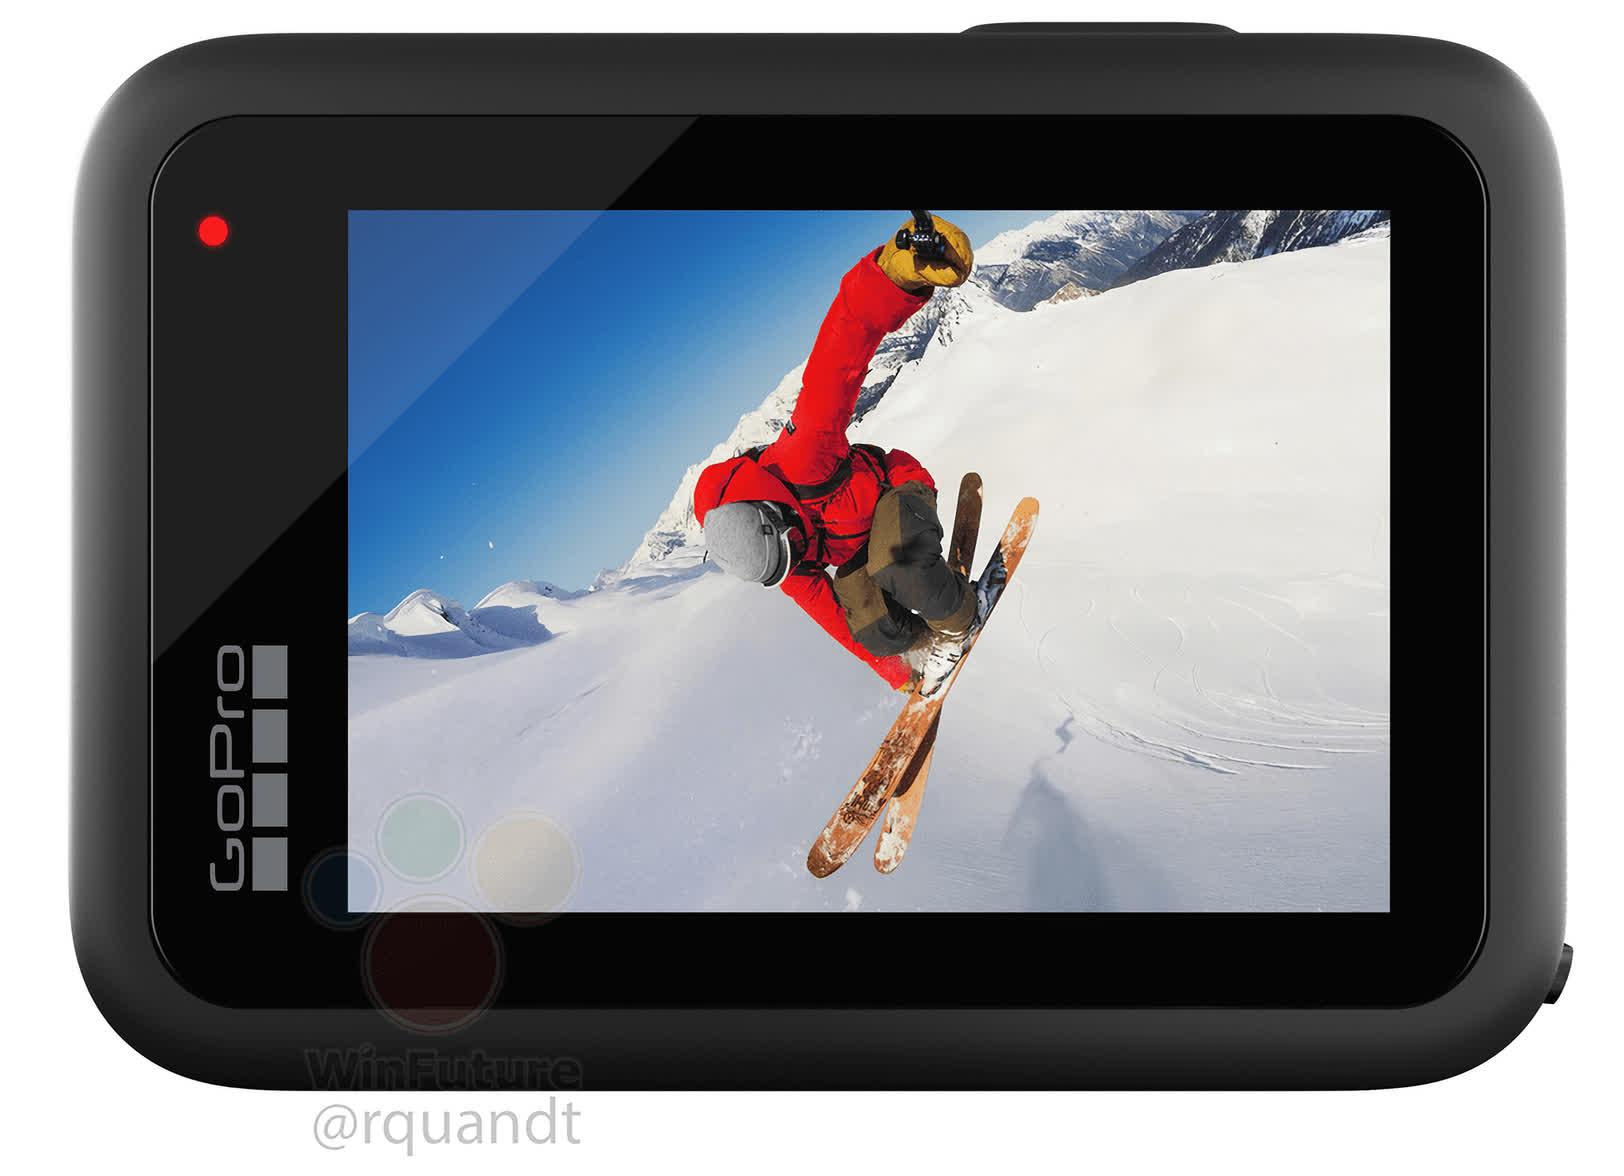 La prochaine camera phare de GoPro la GoPro Hero 10